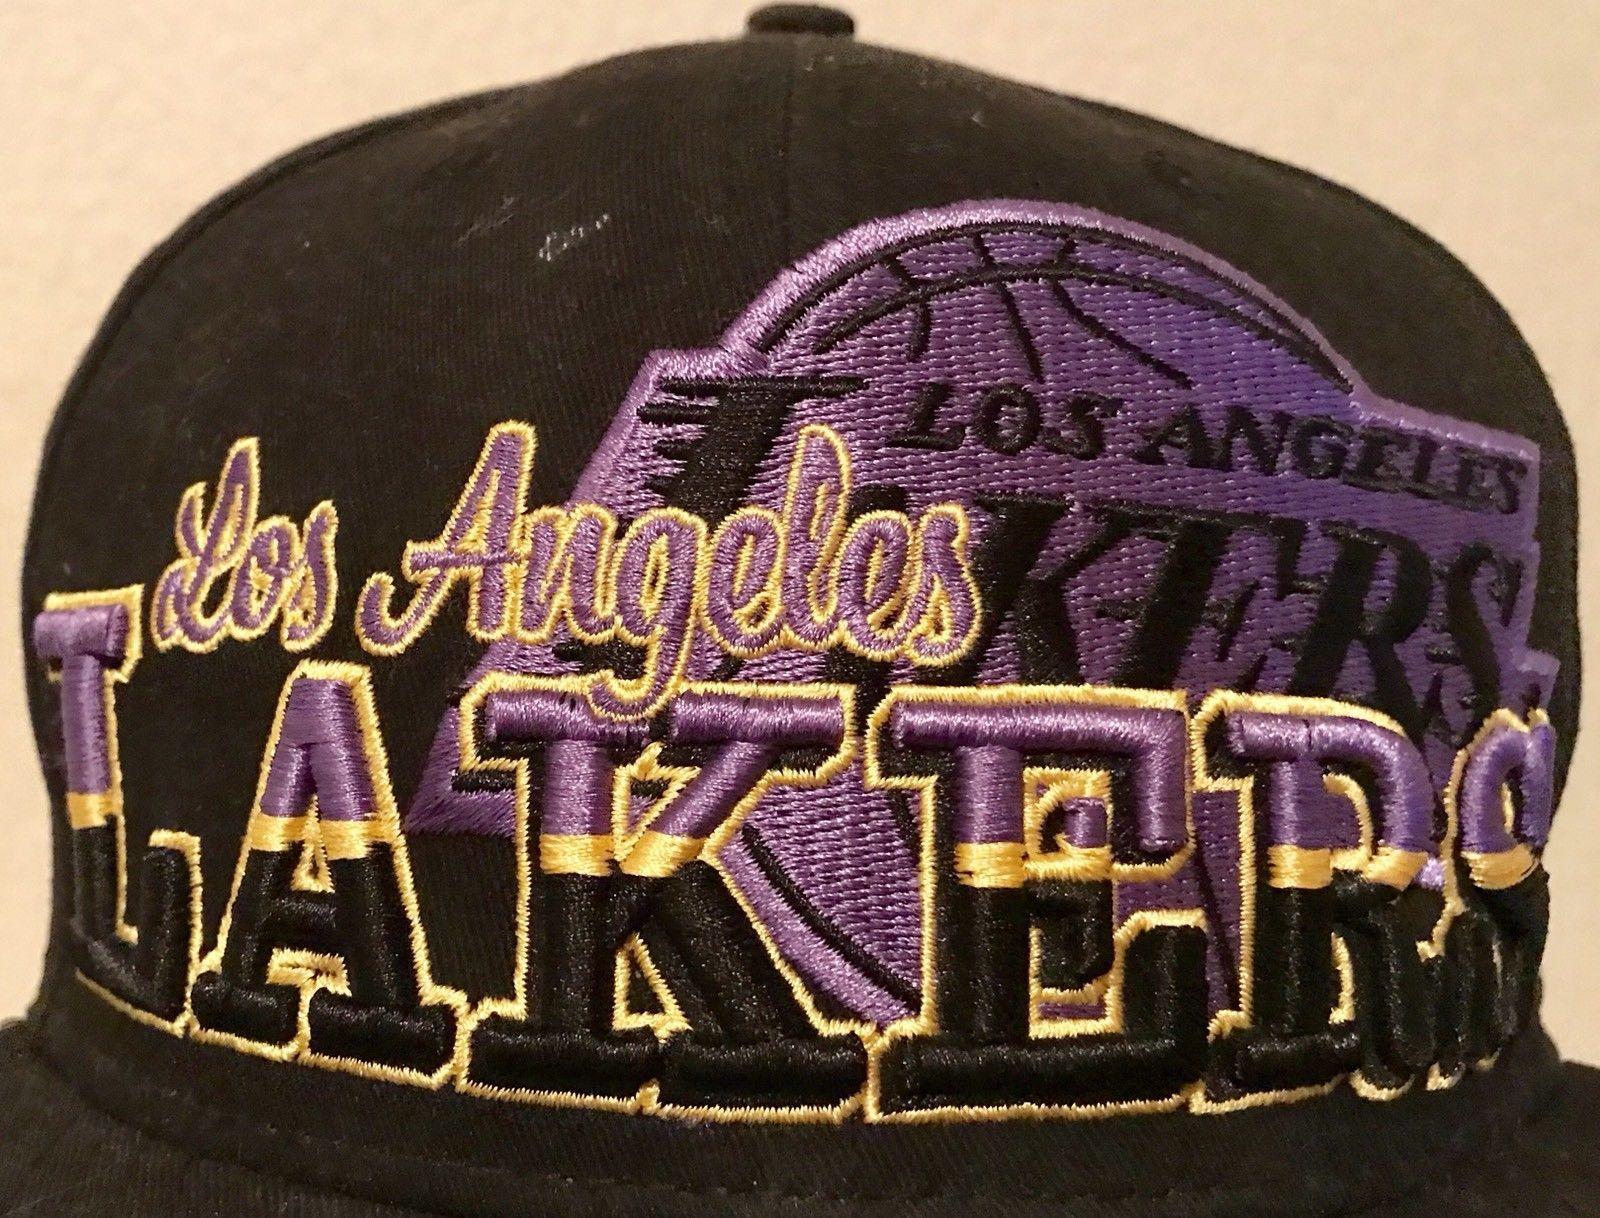 NBA Los Angeles Lakers New Era 9Fifty 950 Snapback Hat Cap Black Gold Purple 4056979dd837